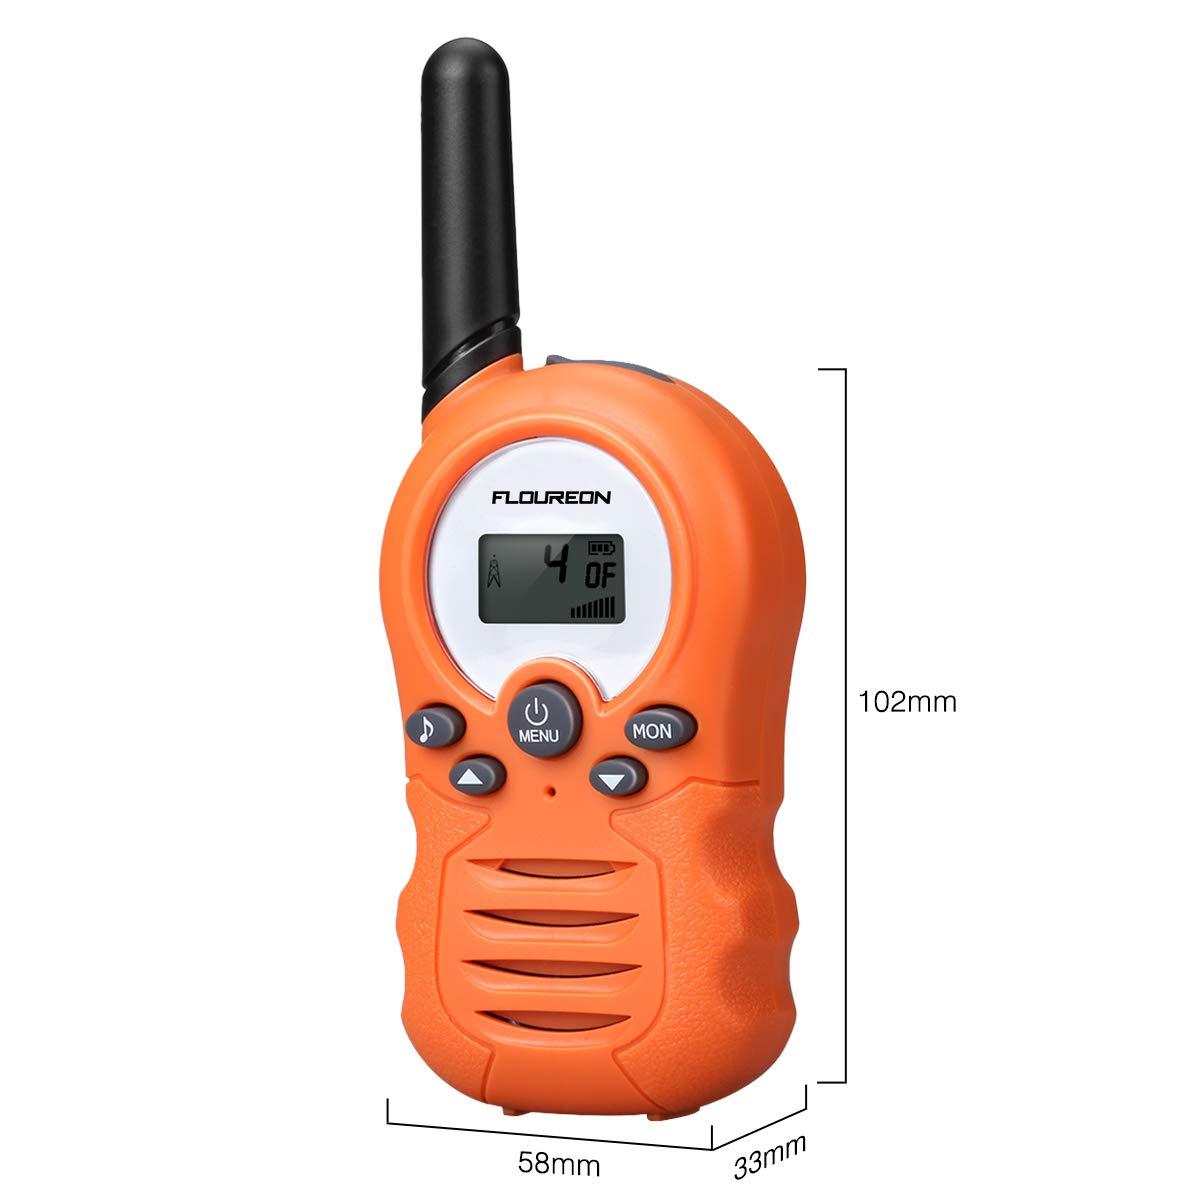 FLOUREON PMR Funkgerät Walkie Talkies 8 Kanäle Walki Talki Funkhandy Interphone mit LC-Display (Gelb-02)